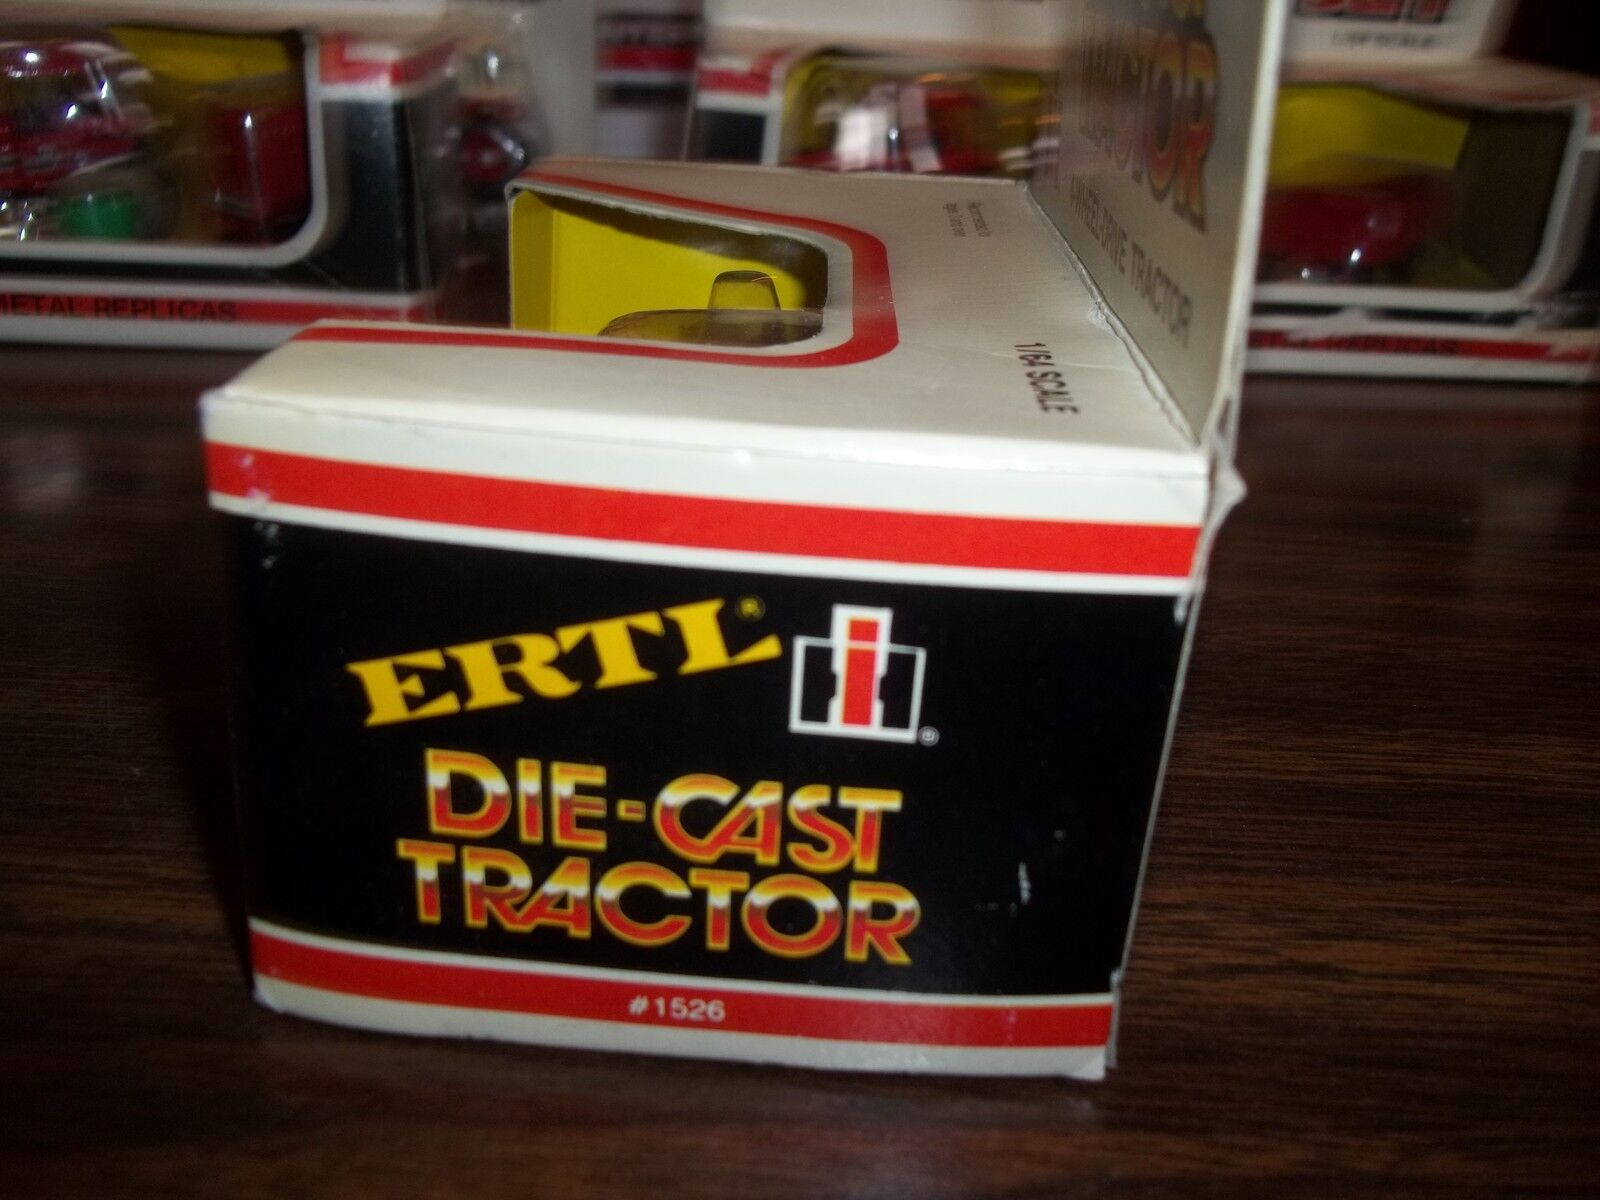 ERTL 1/64 SCALE DIE-CAST INTERNATIONAL 6388 2+2 4-WHEEL-DRIVE TRACTOR PART#1526 1